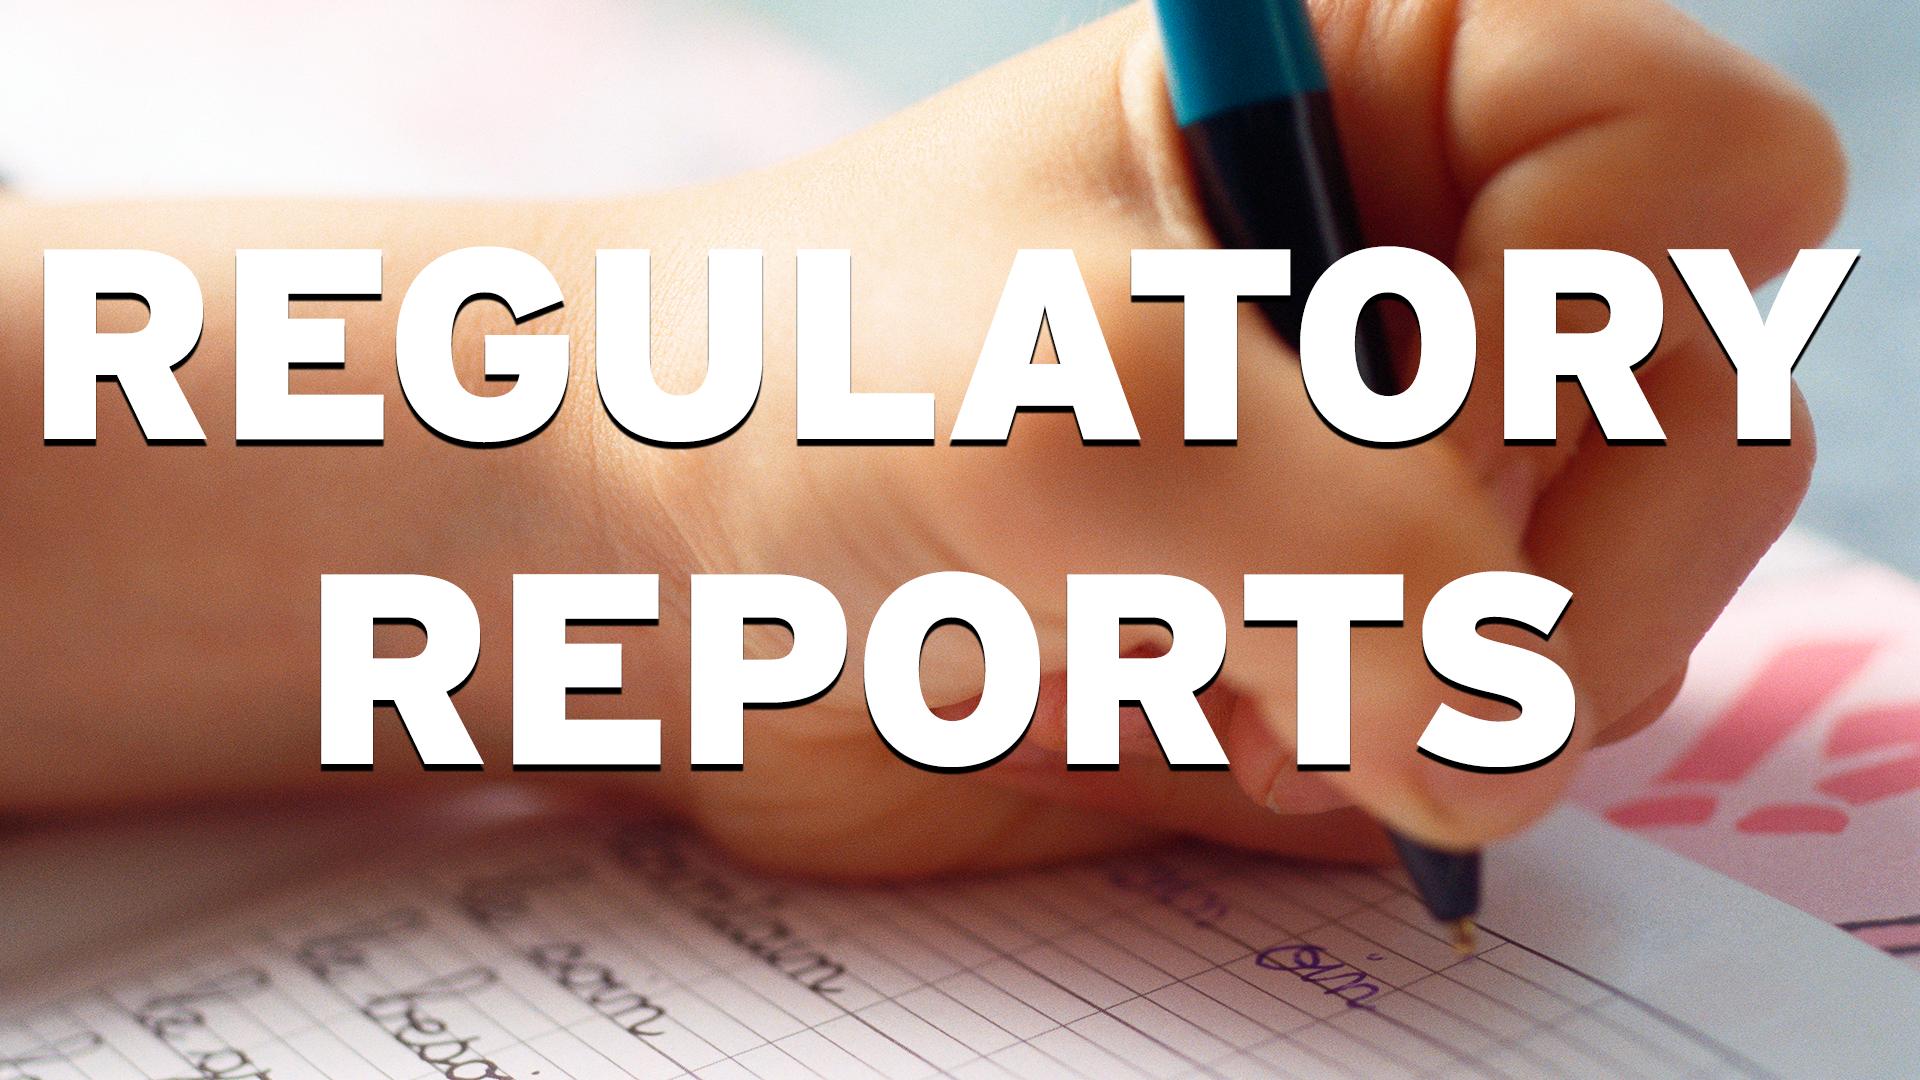 Regulatory reports image